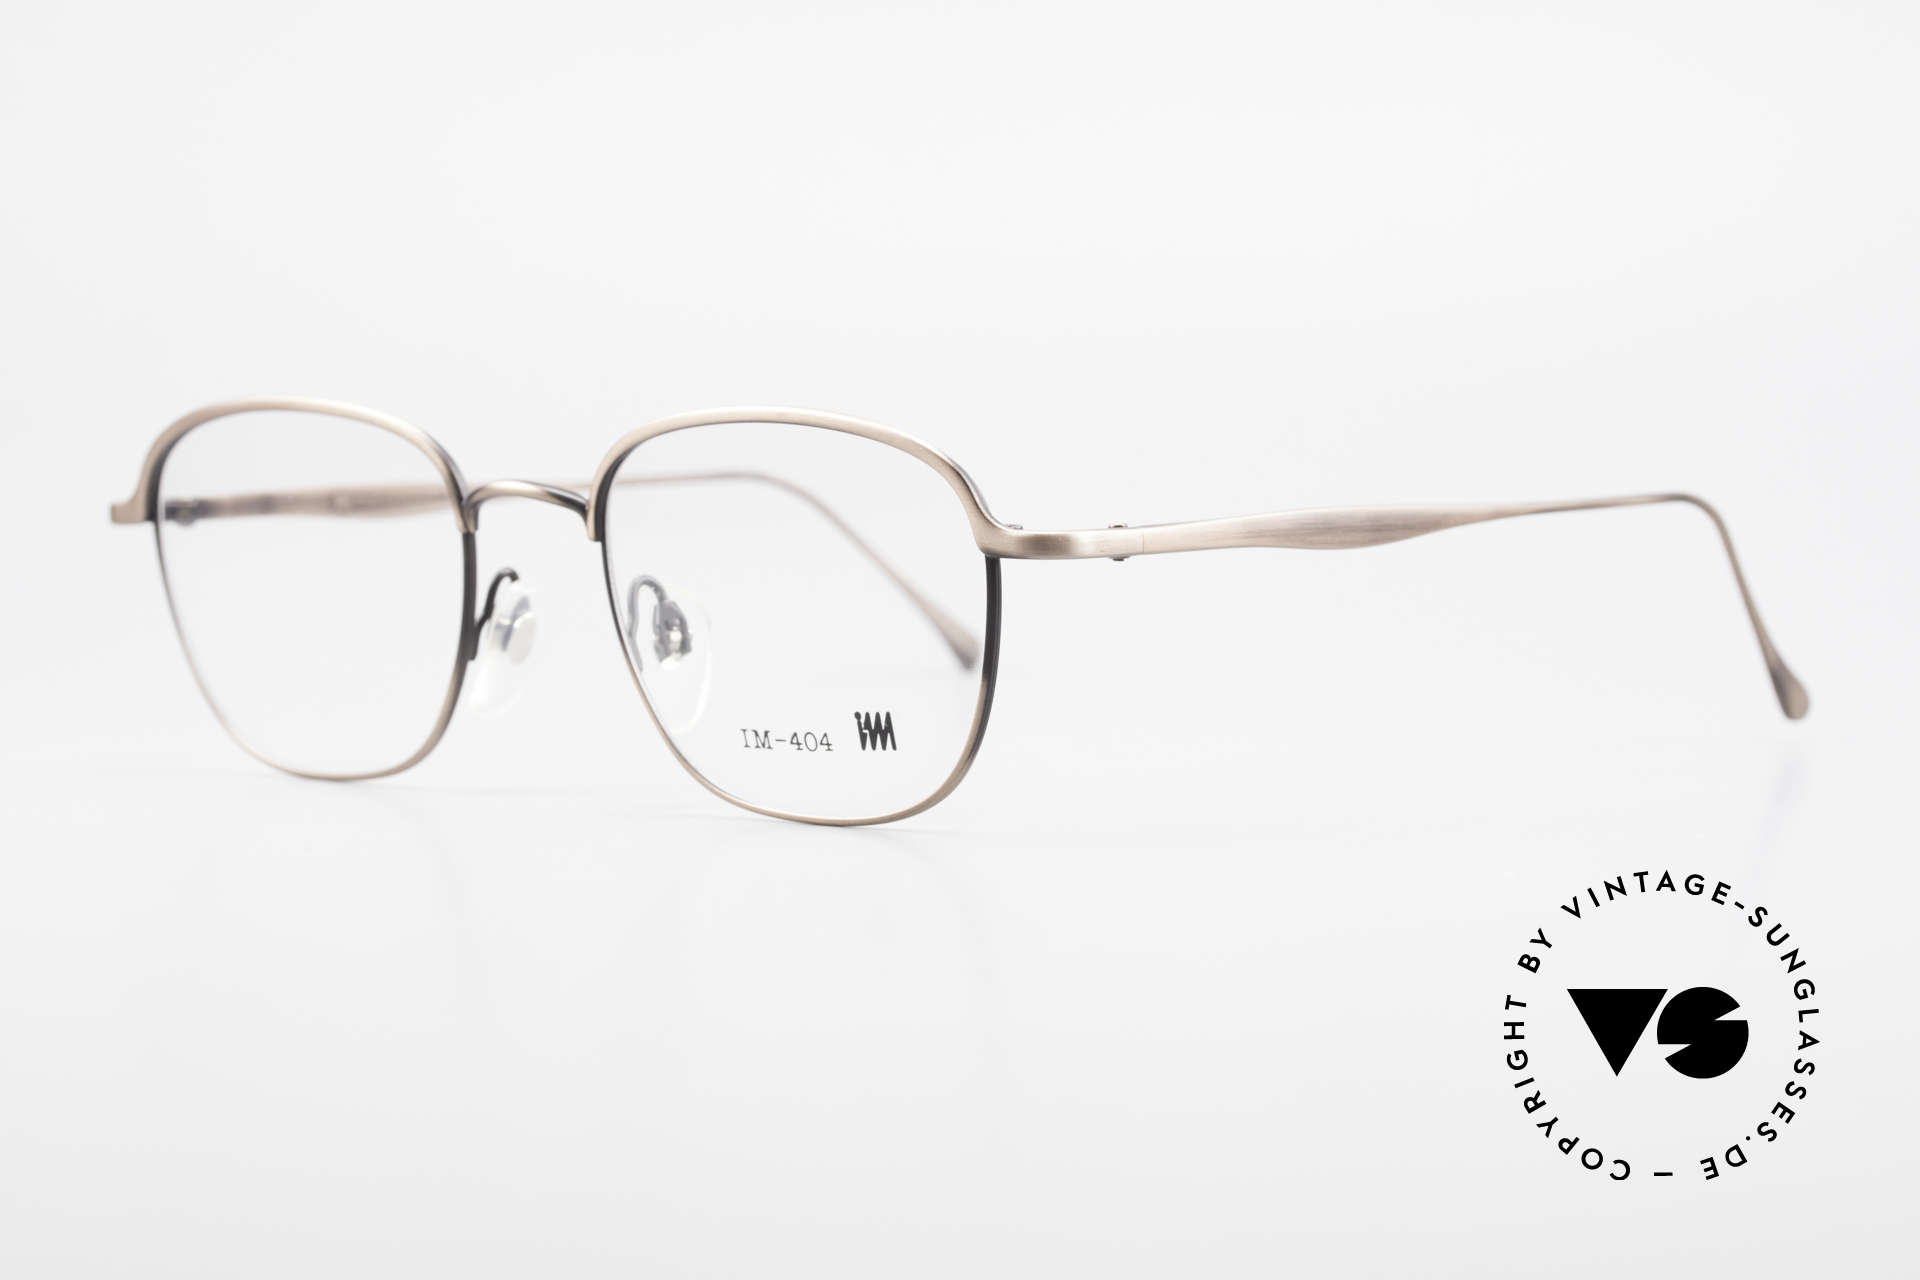 Miyake Design Studio IM404 Connoisseur Eyeglasses 90's, MIYAKE Design Studio = Issey Miyake = I.M. 404, Made for Men and Women